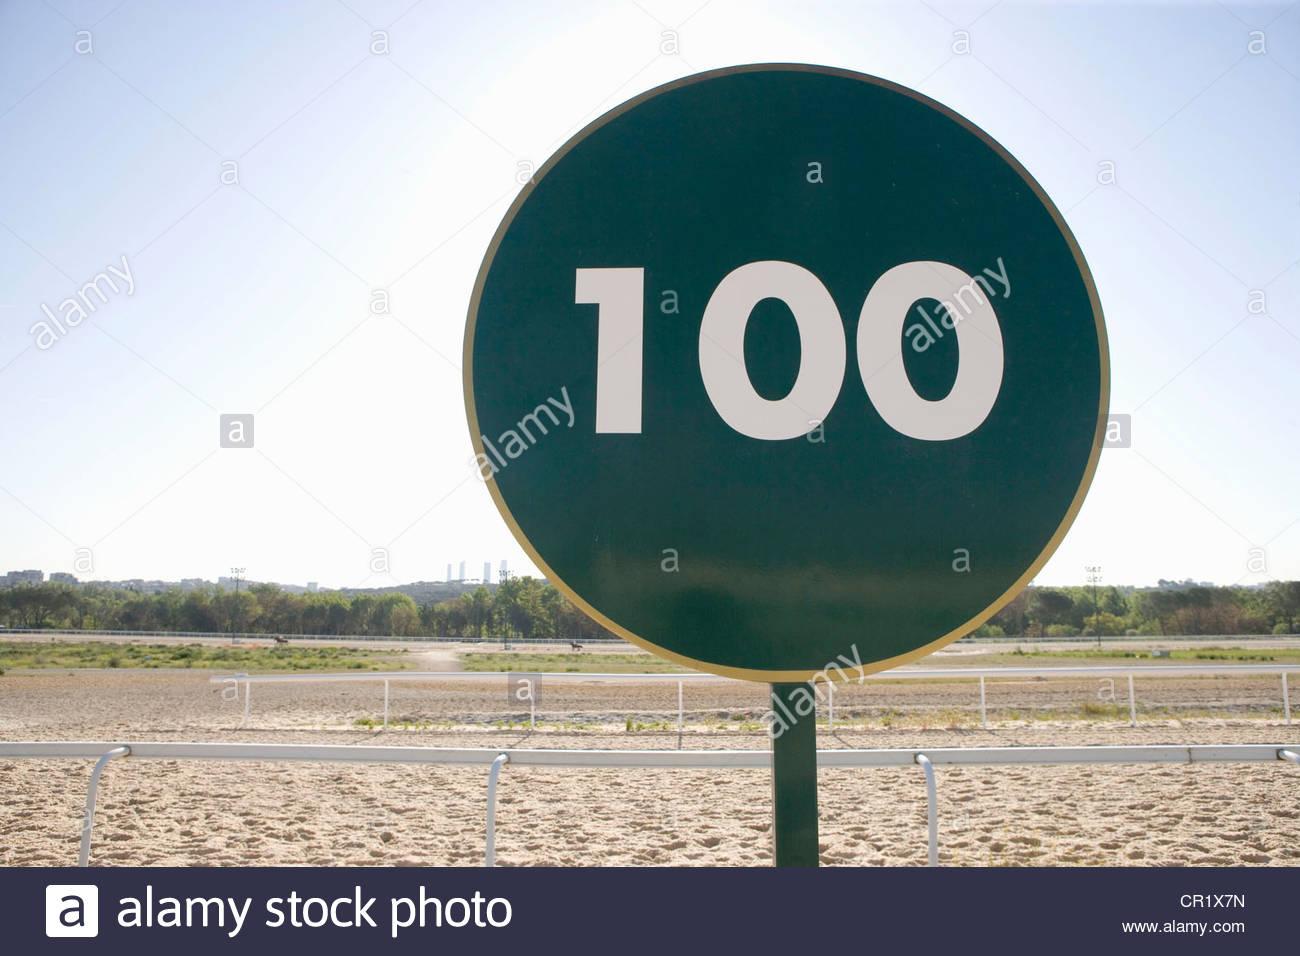 Sign reading ì100î on sandy track - Stock Image